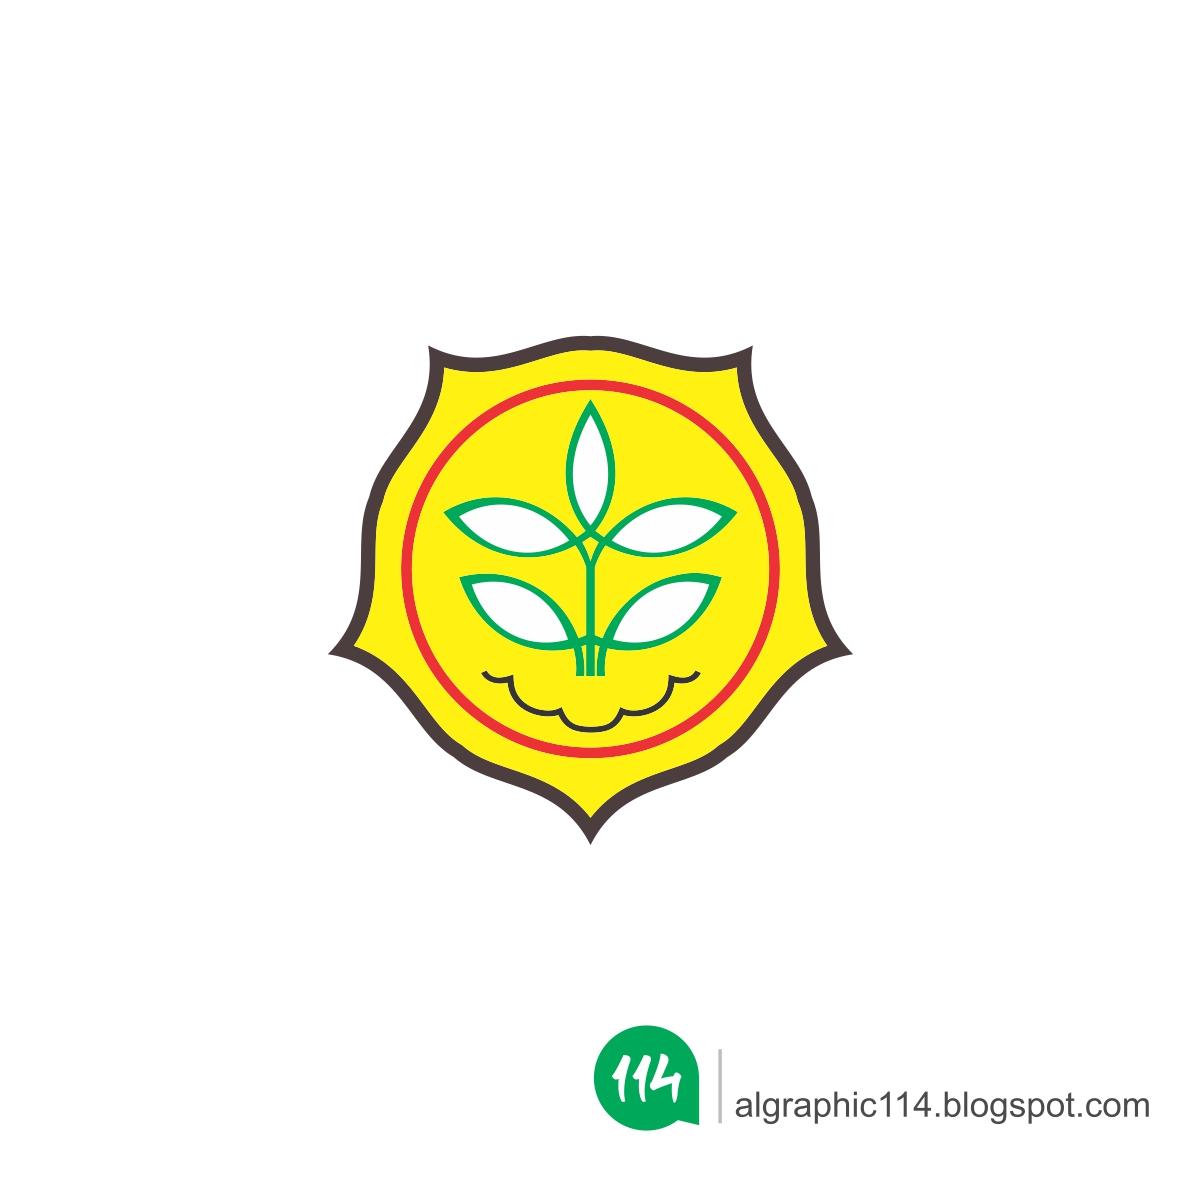 Logo Departemen Pertanian Vector Cdr Algraphic 114